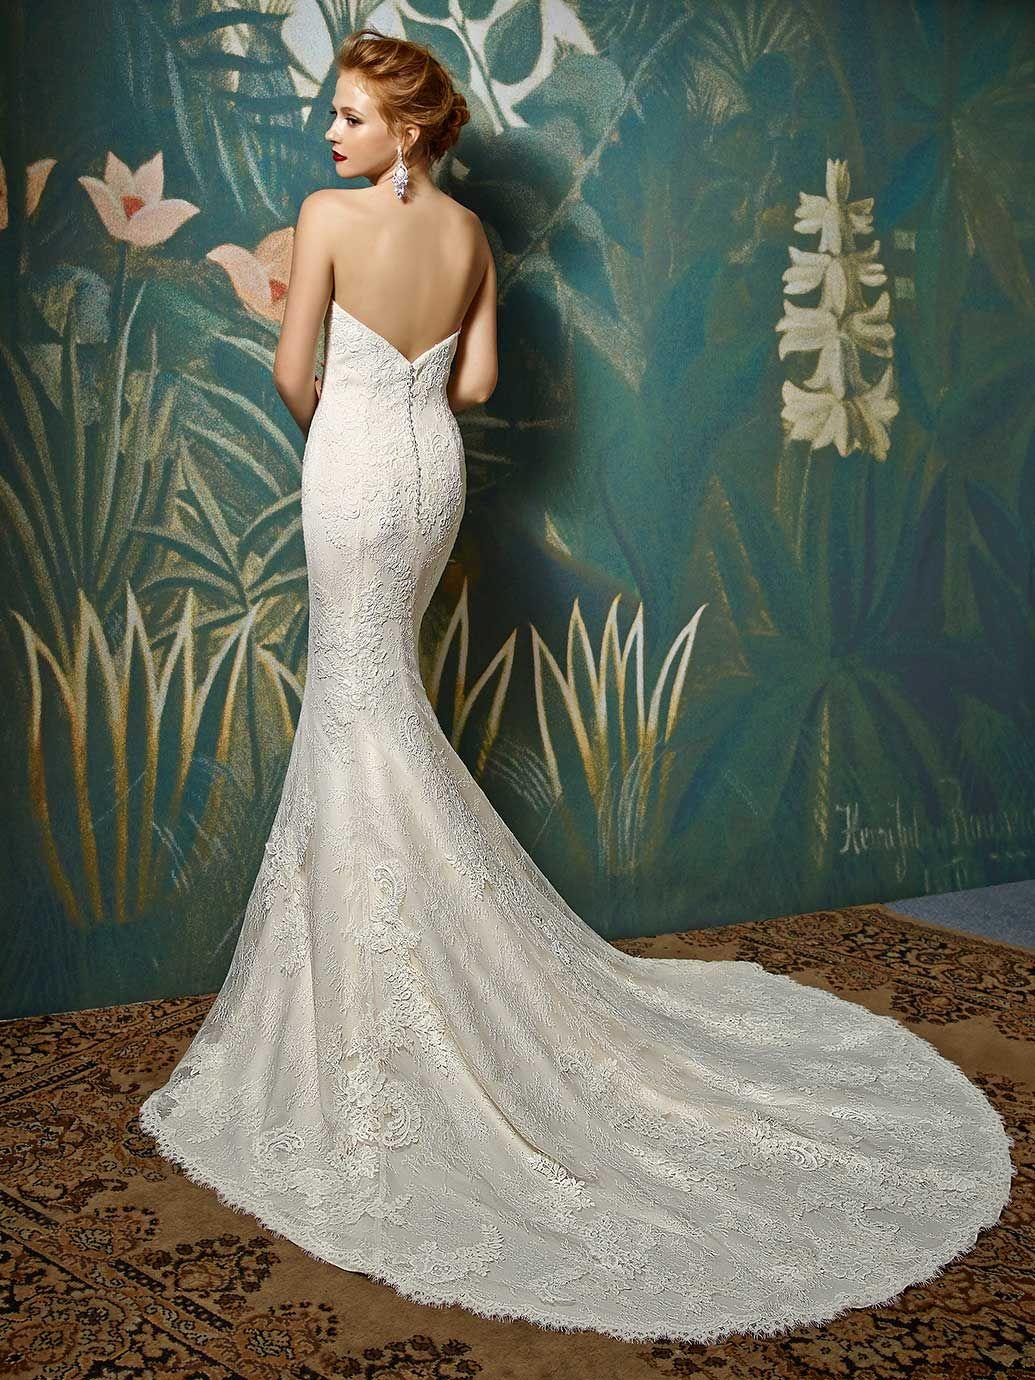 Joelle enzoani blue collection mermaid wedding dress dream joelle enzoani blue collection mermaid wedding dress ombrellifo Images